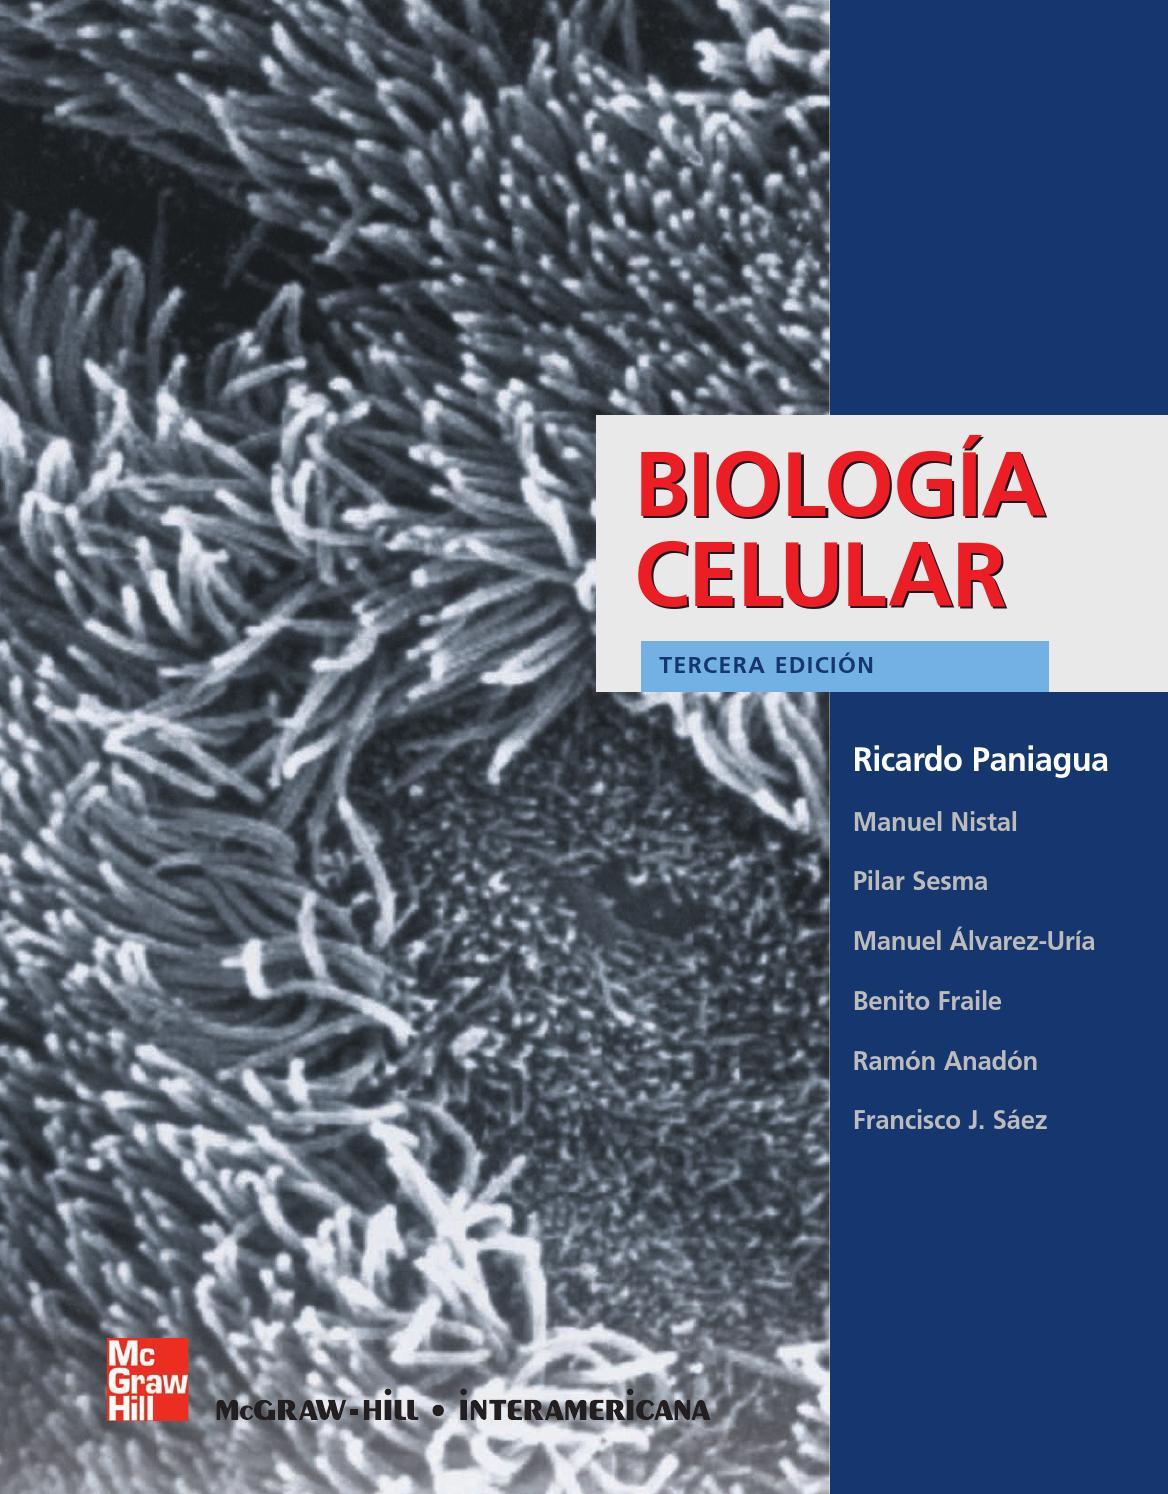 Biologia Celular By Joseph Kent Semdel Issuu